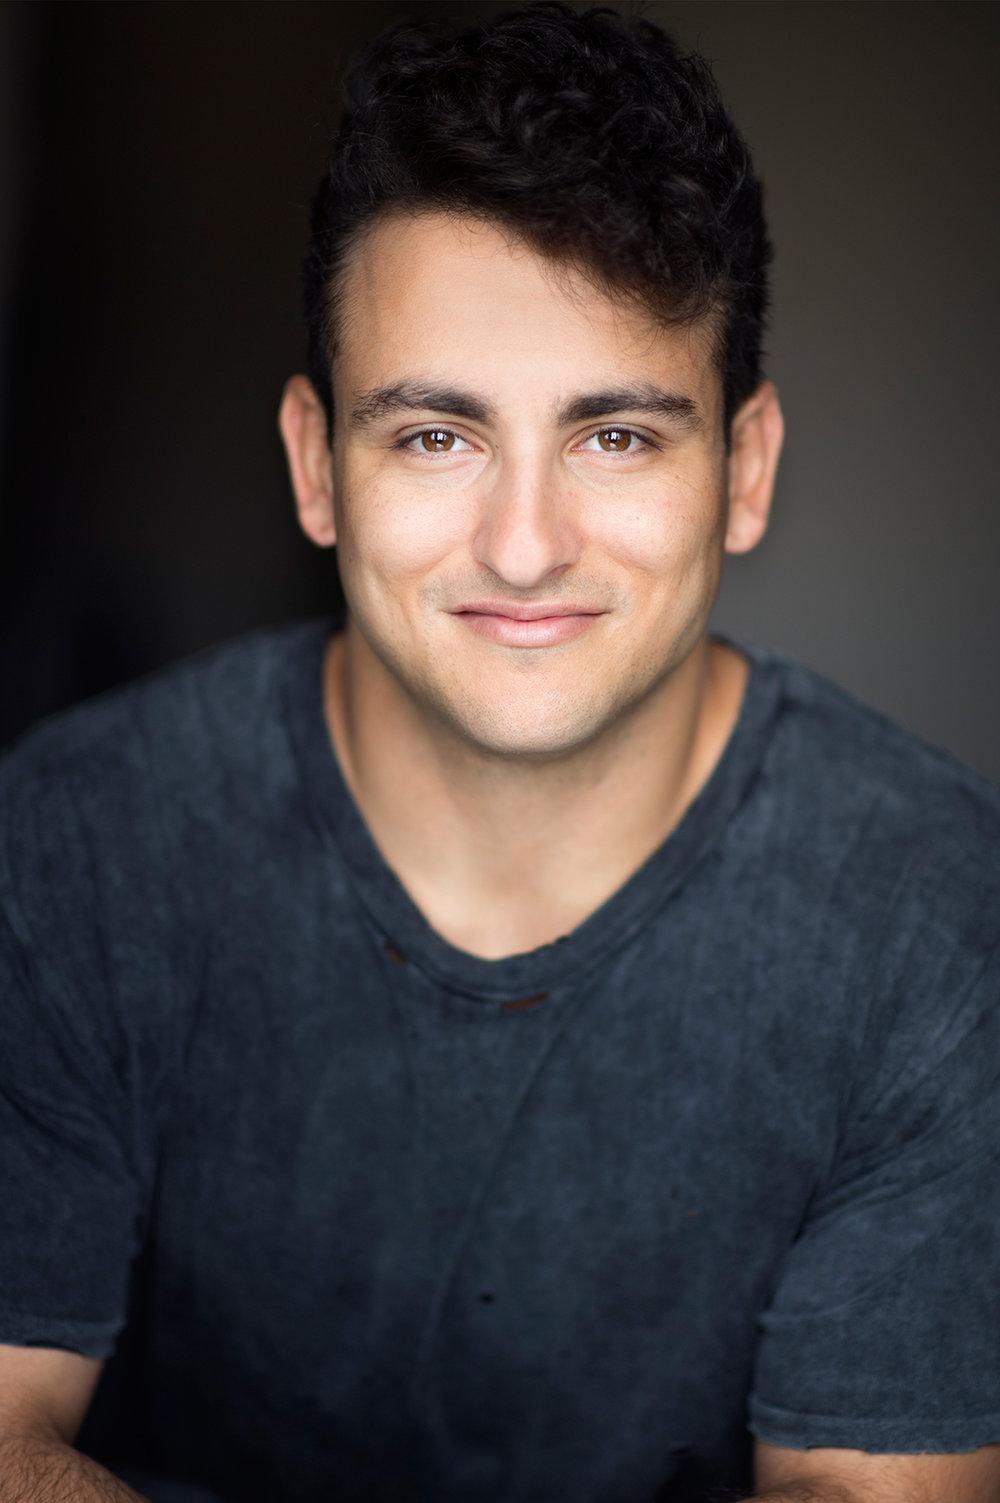 Daniel Raso